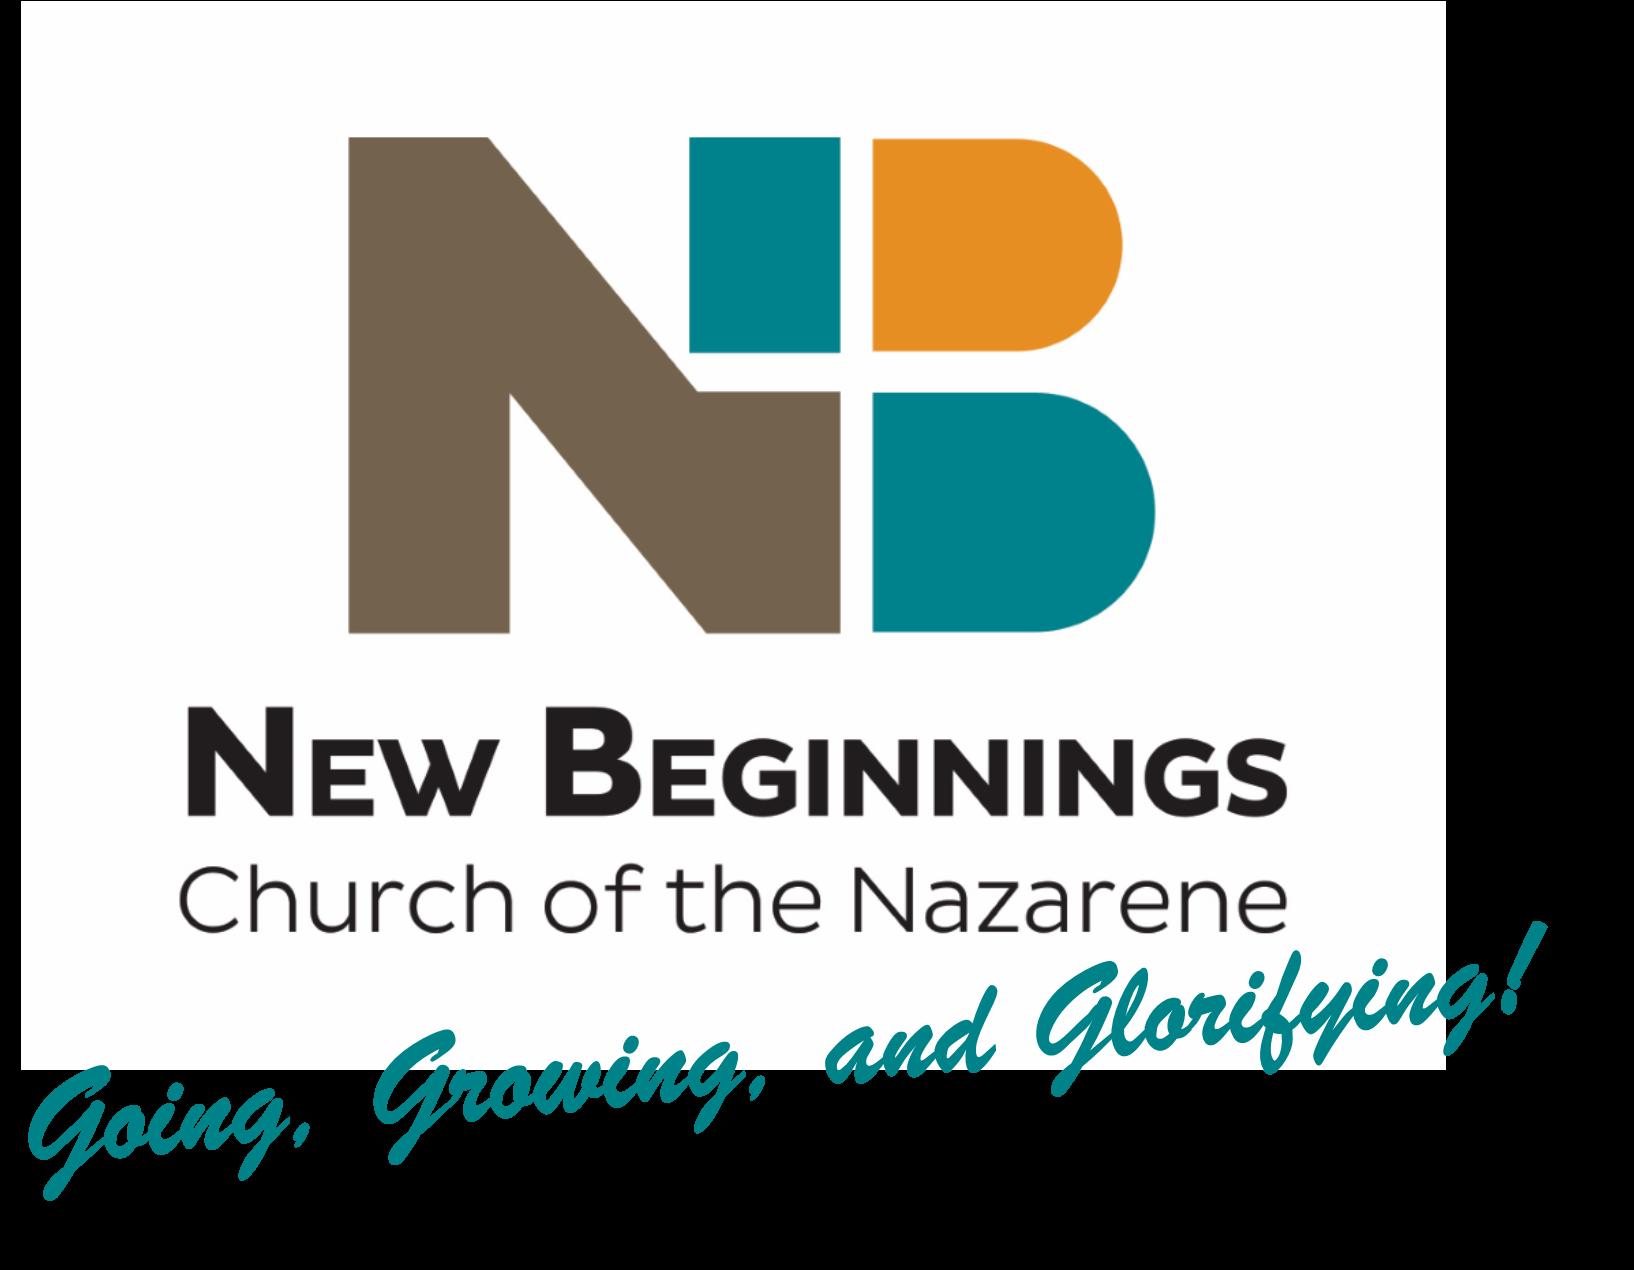 New Beginnings | Church of the Nazarene – Loudon, NH